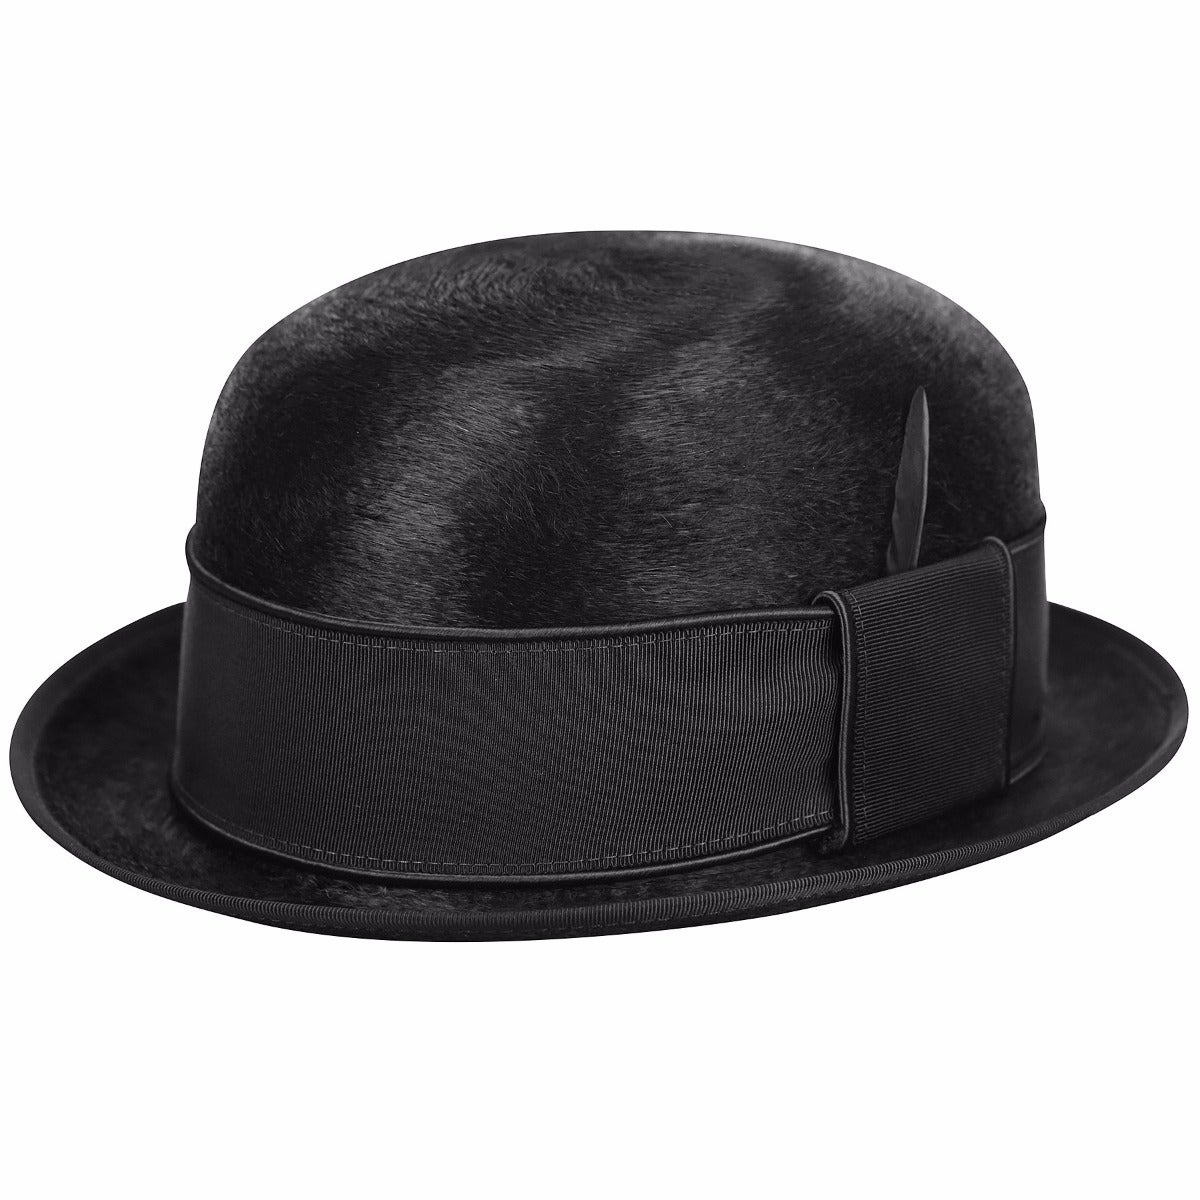 Steampunk Hats | Top Hats | Bowler Palance Bowler $250.00 AT vintagedancer.com